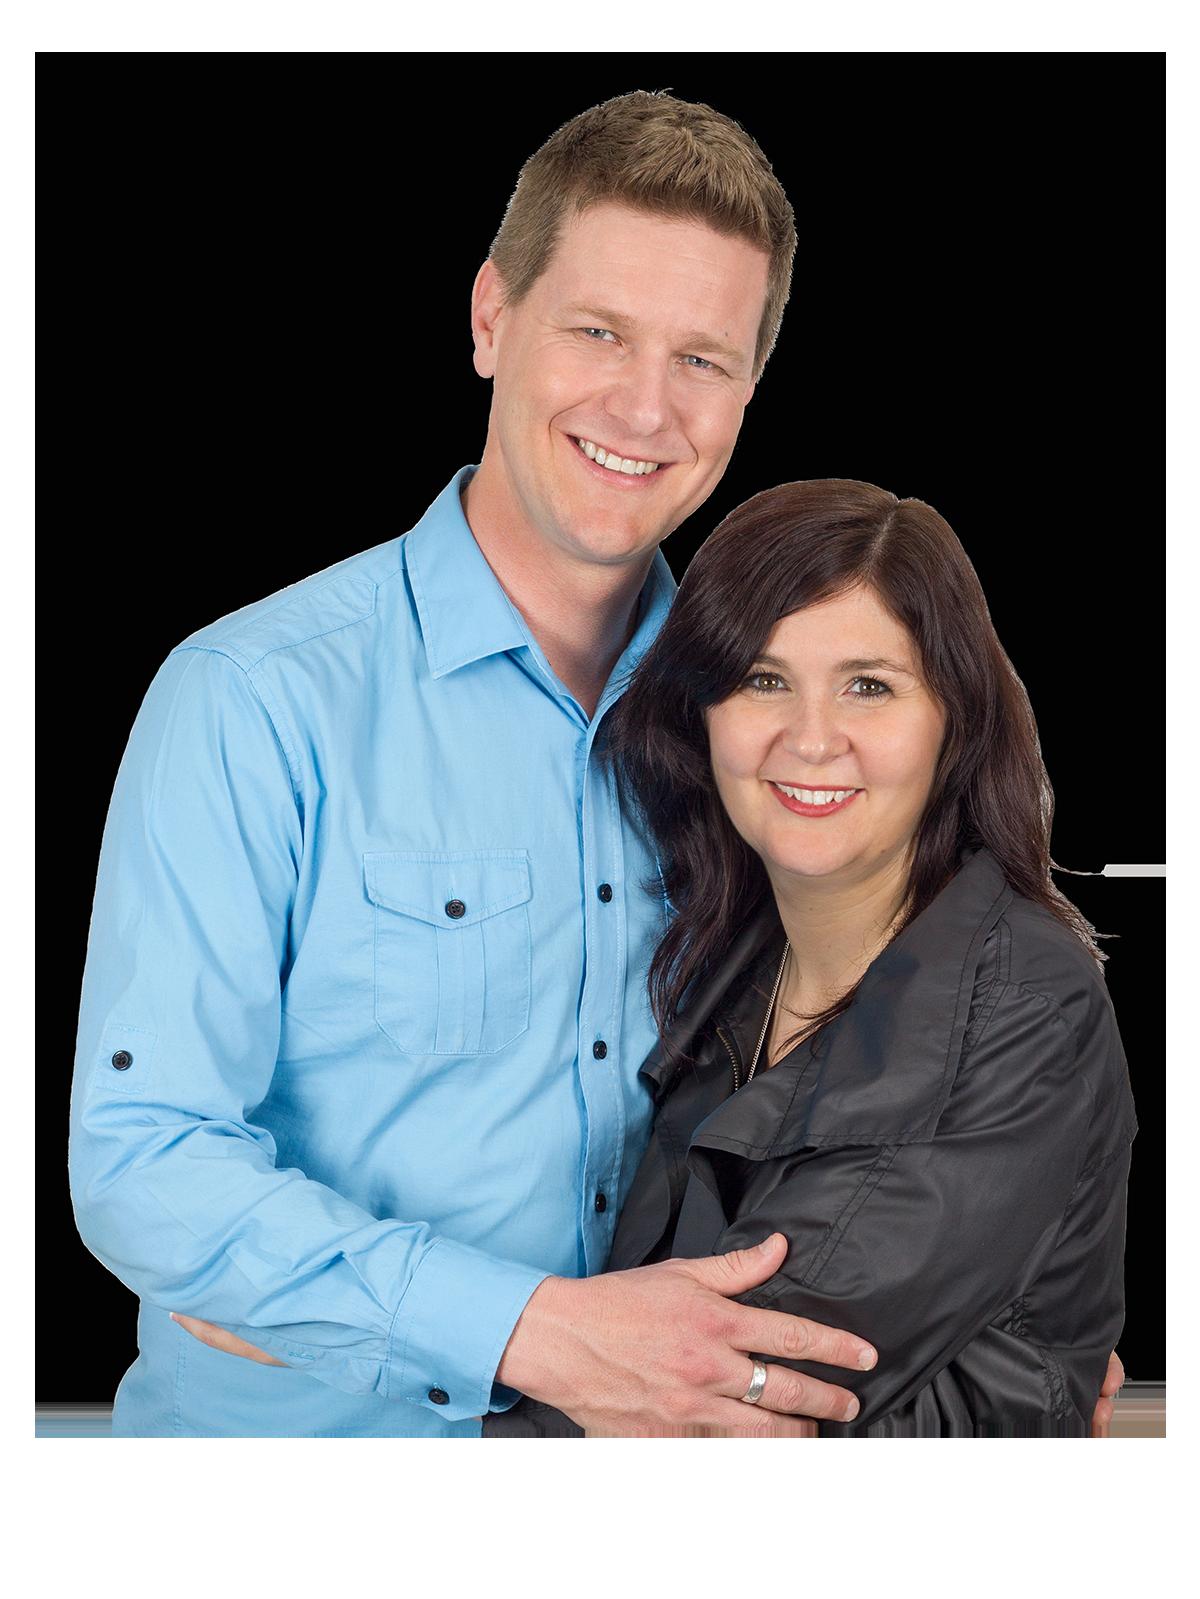 Peter & Annika Morton